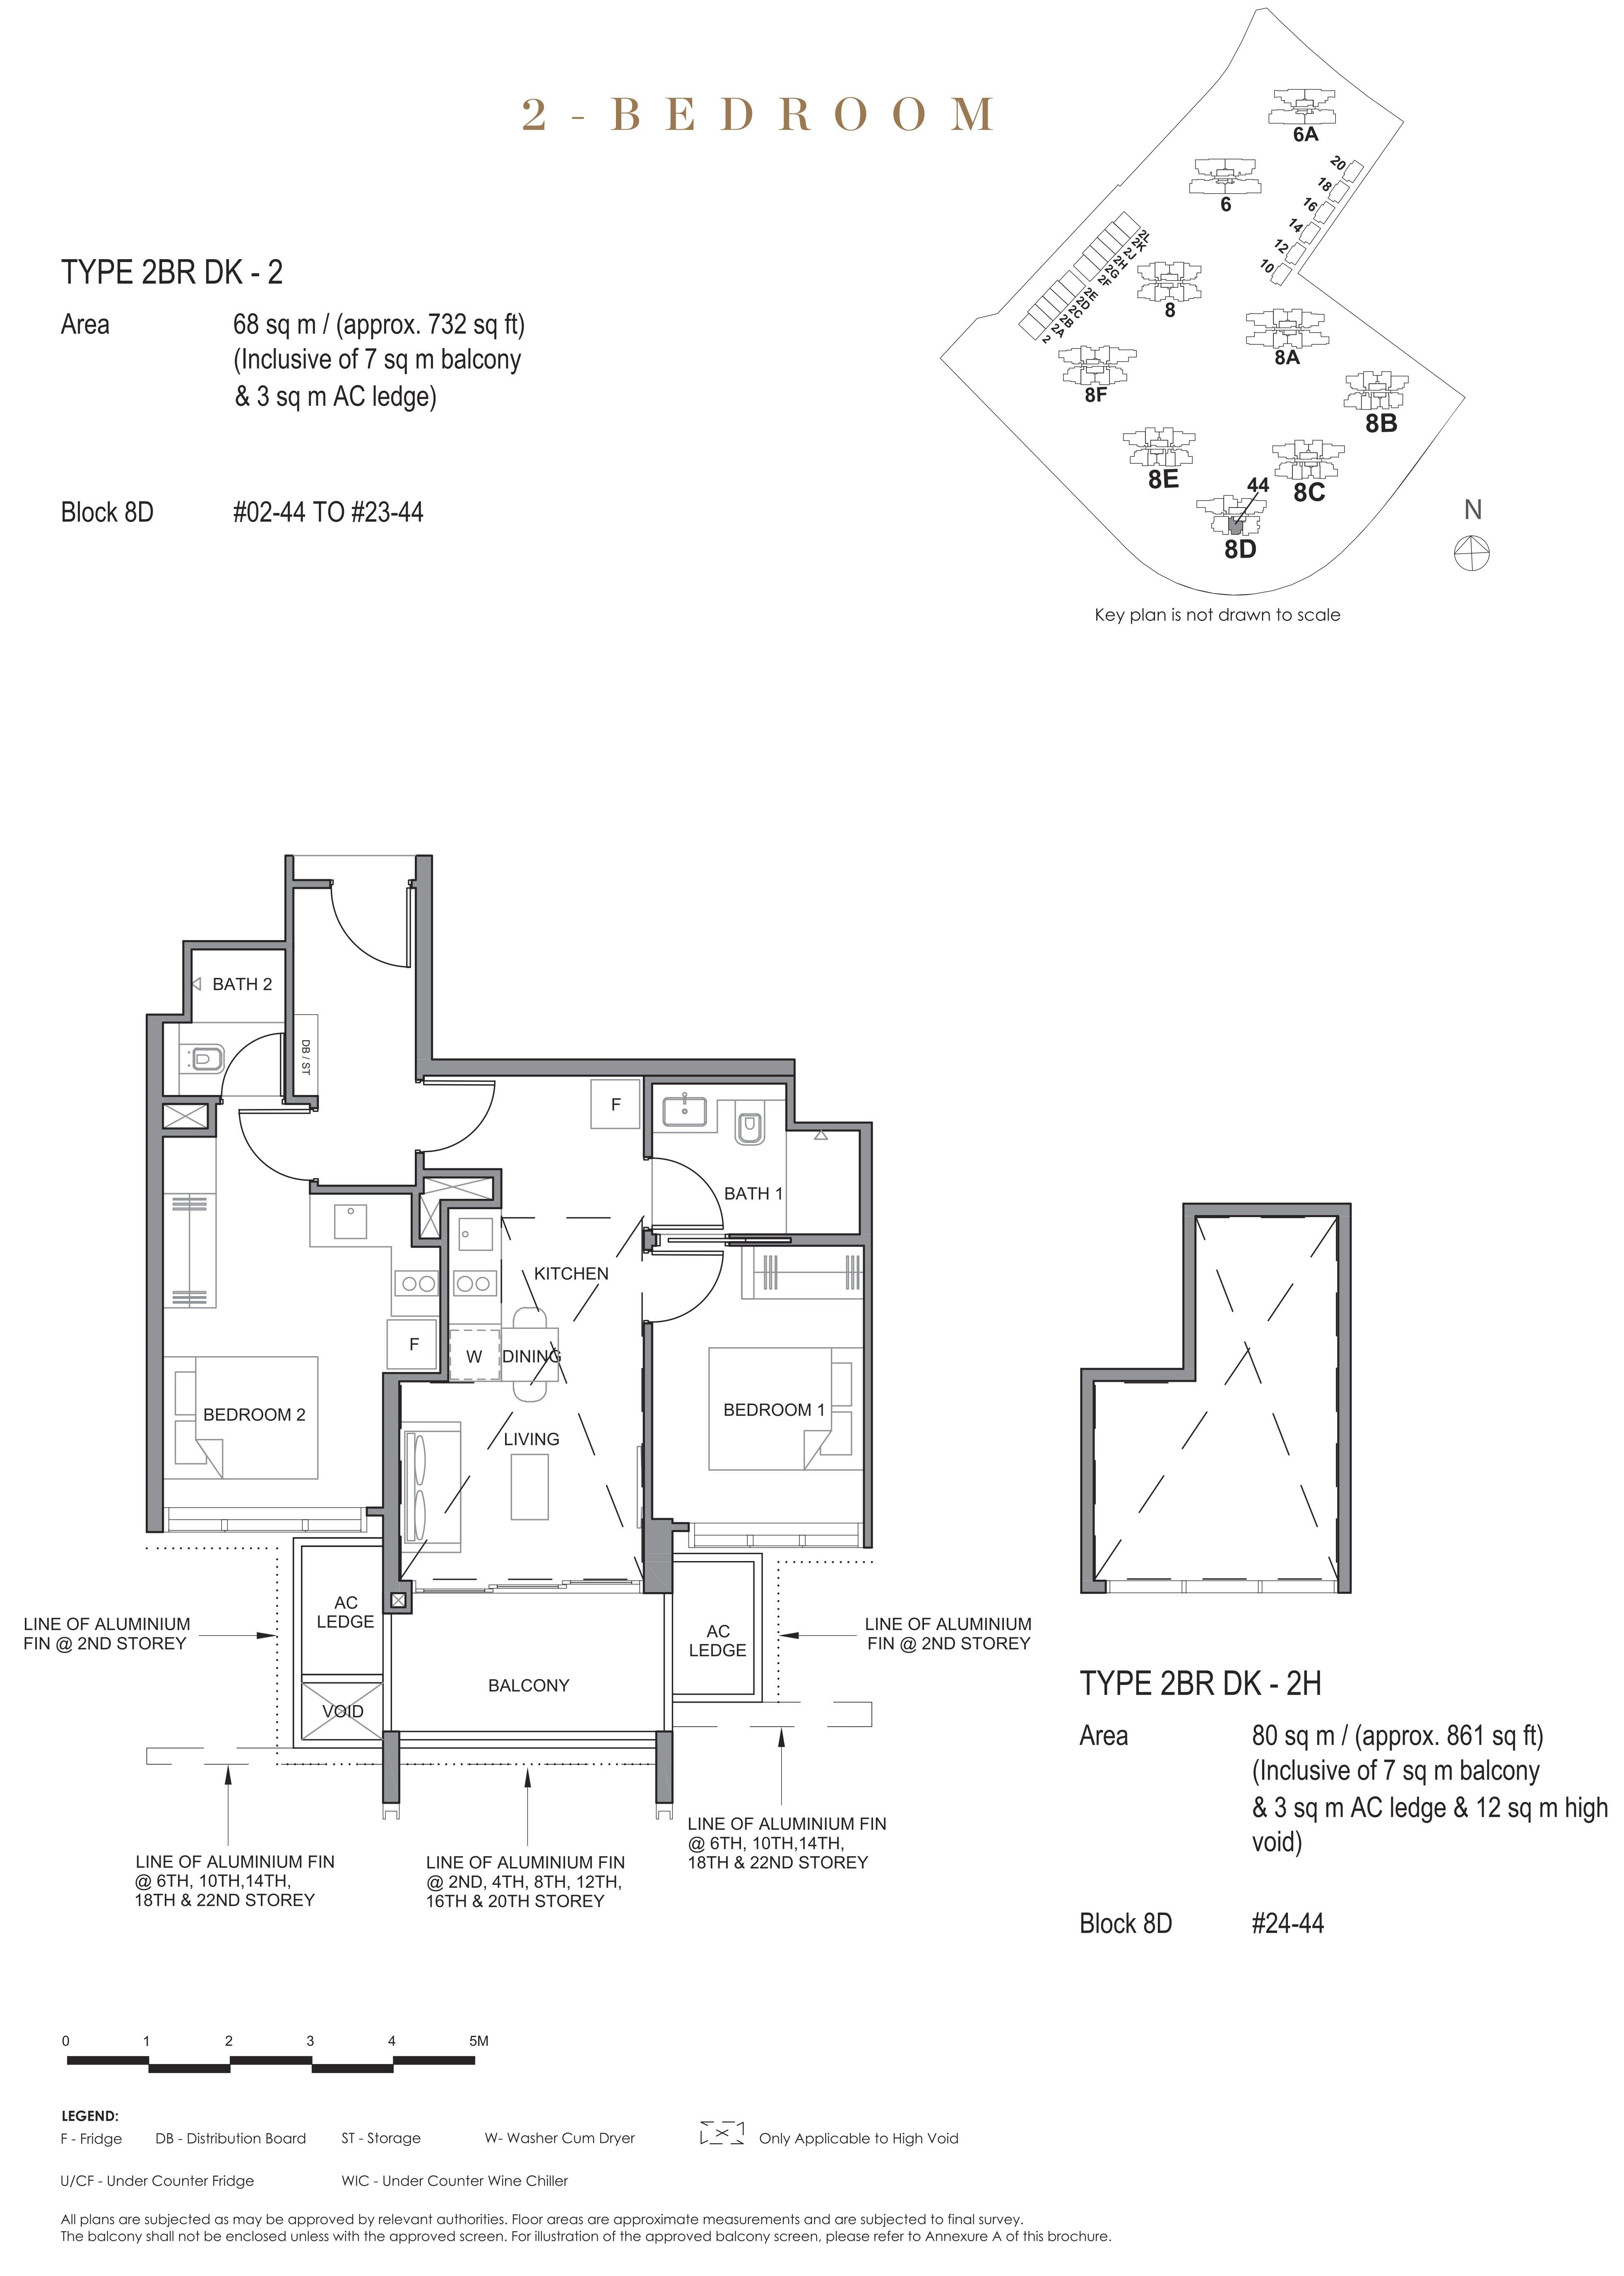 Parc Clematis 锦泰门第 contemporary 2 bedroom dk 2卧房-双钥匙 2BR-dk2